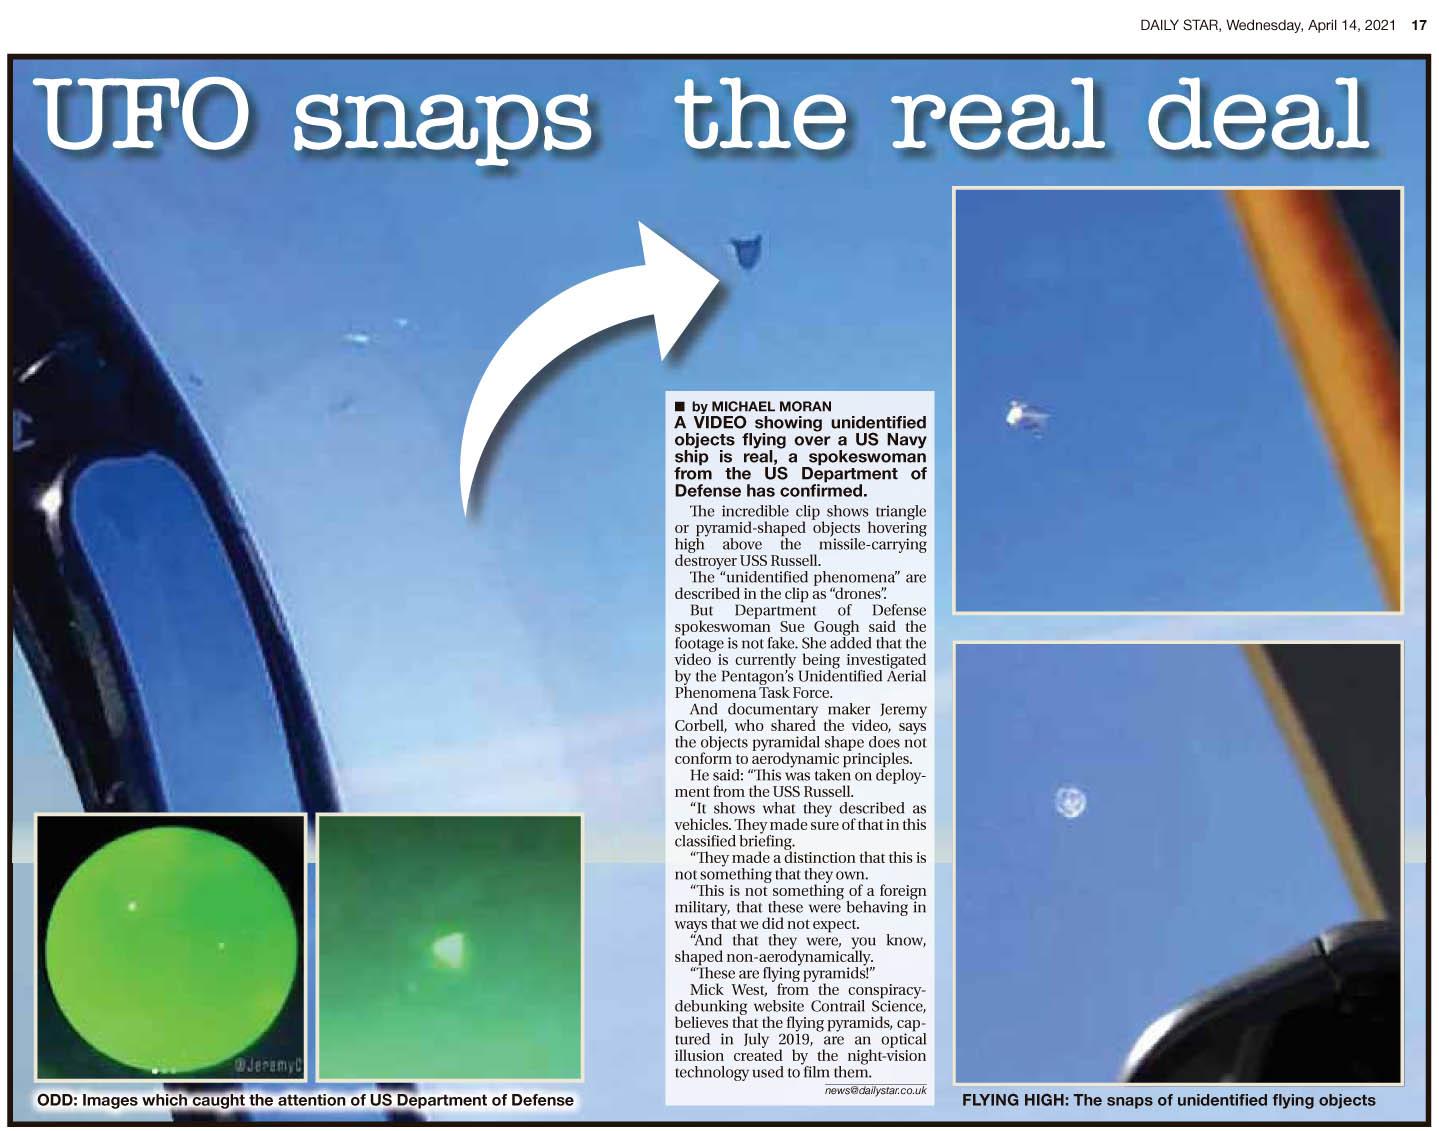 DStar 210414 UFO.jpg